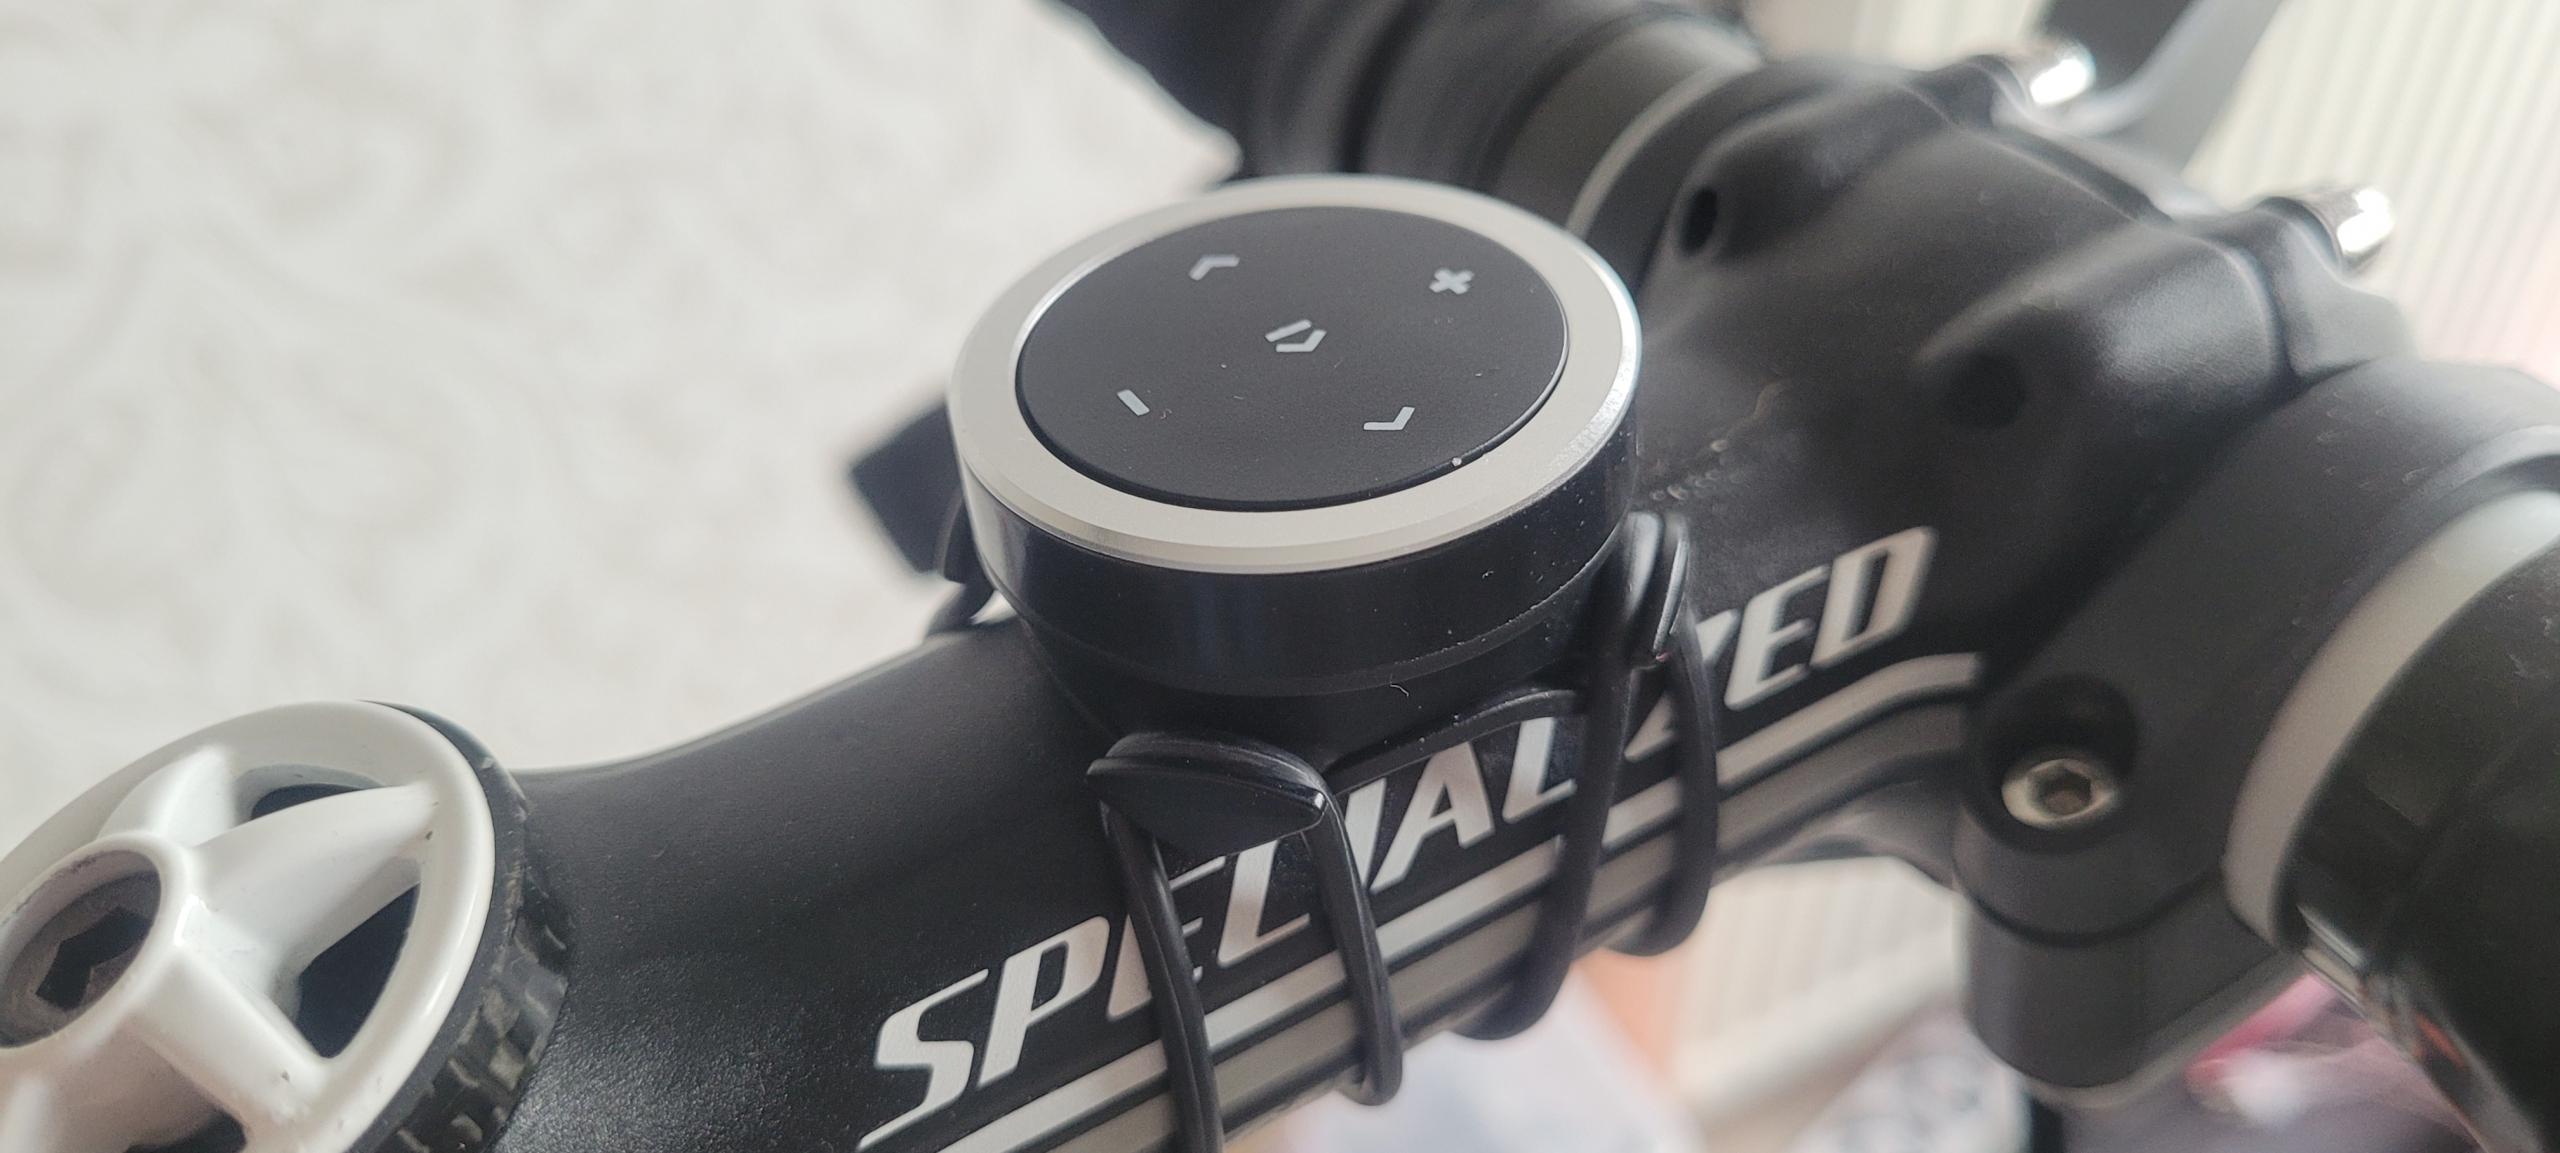 Zwift-Remote-Mounted